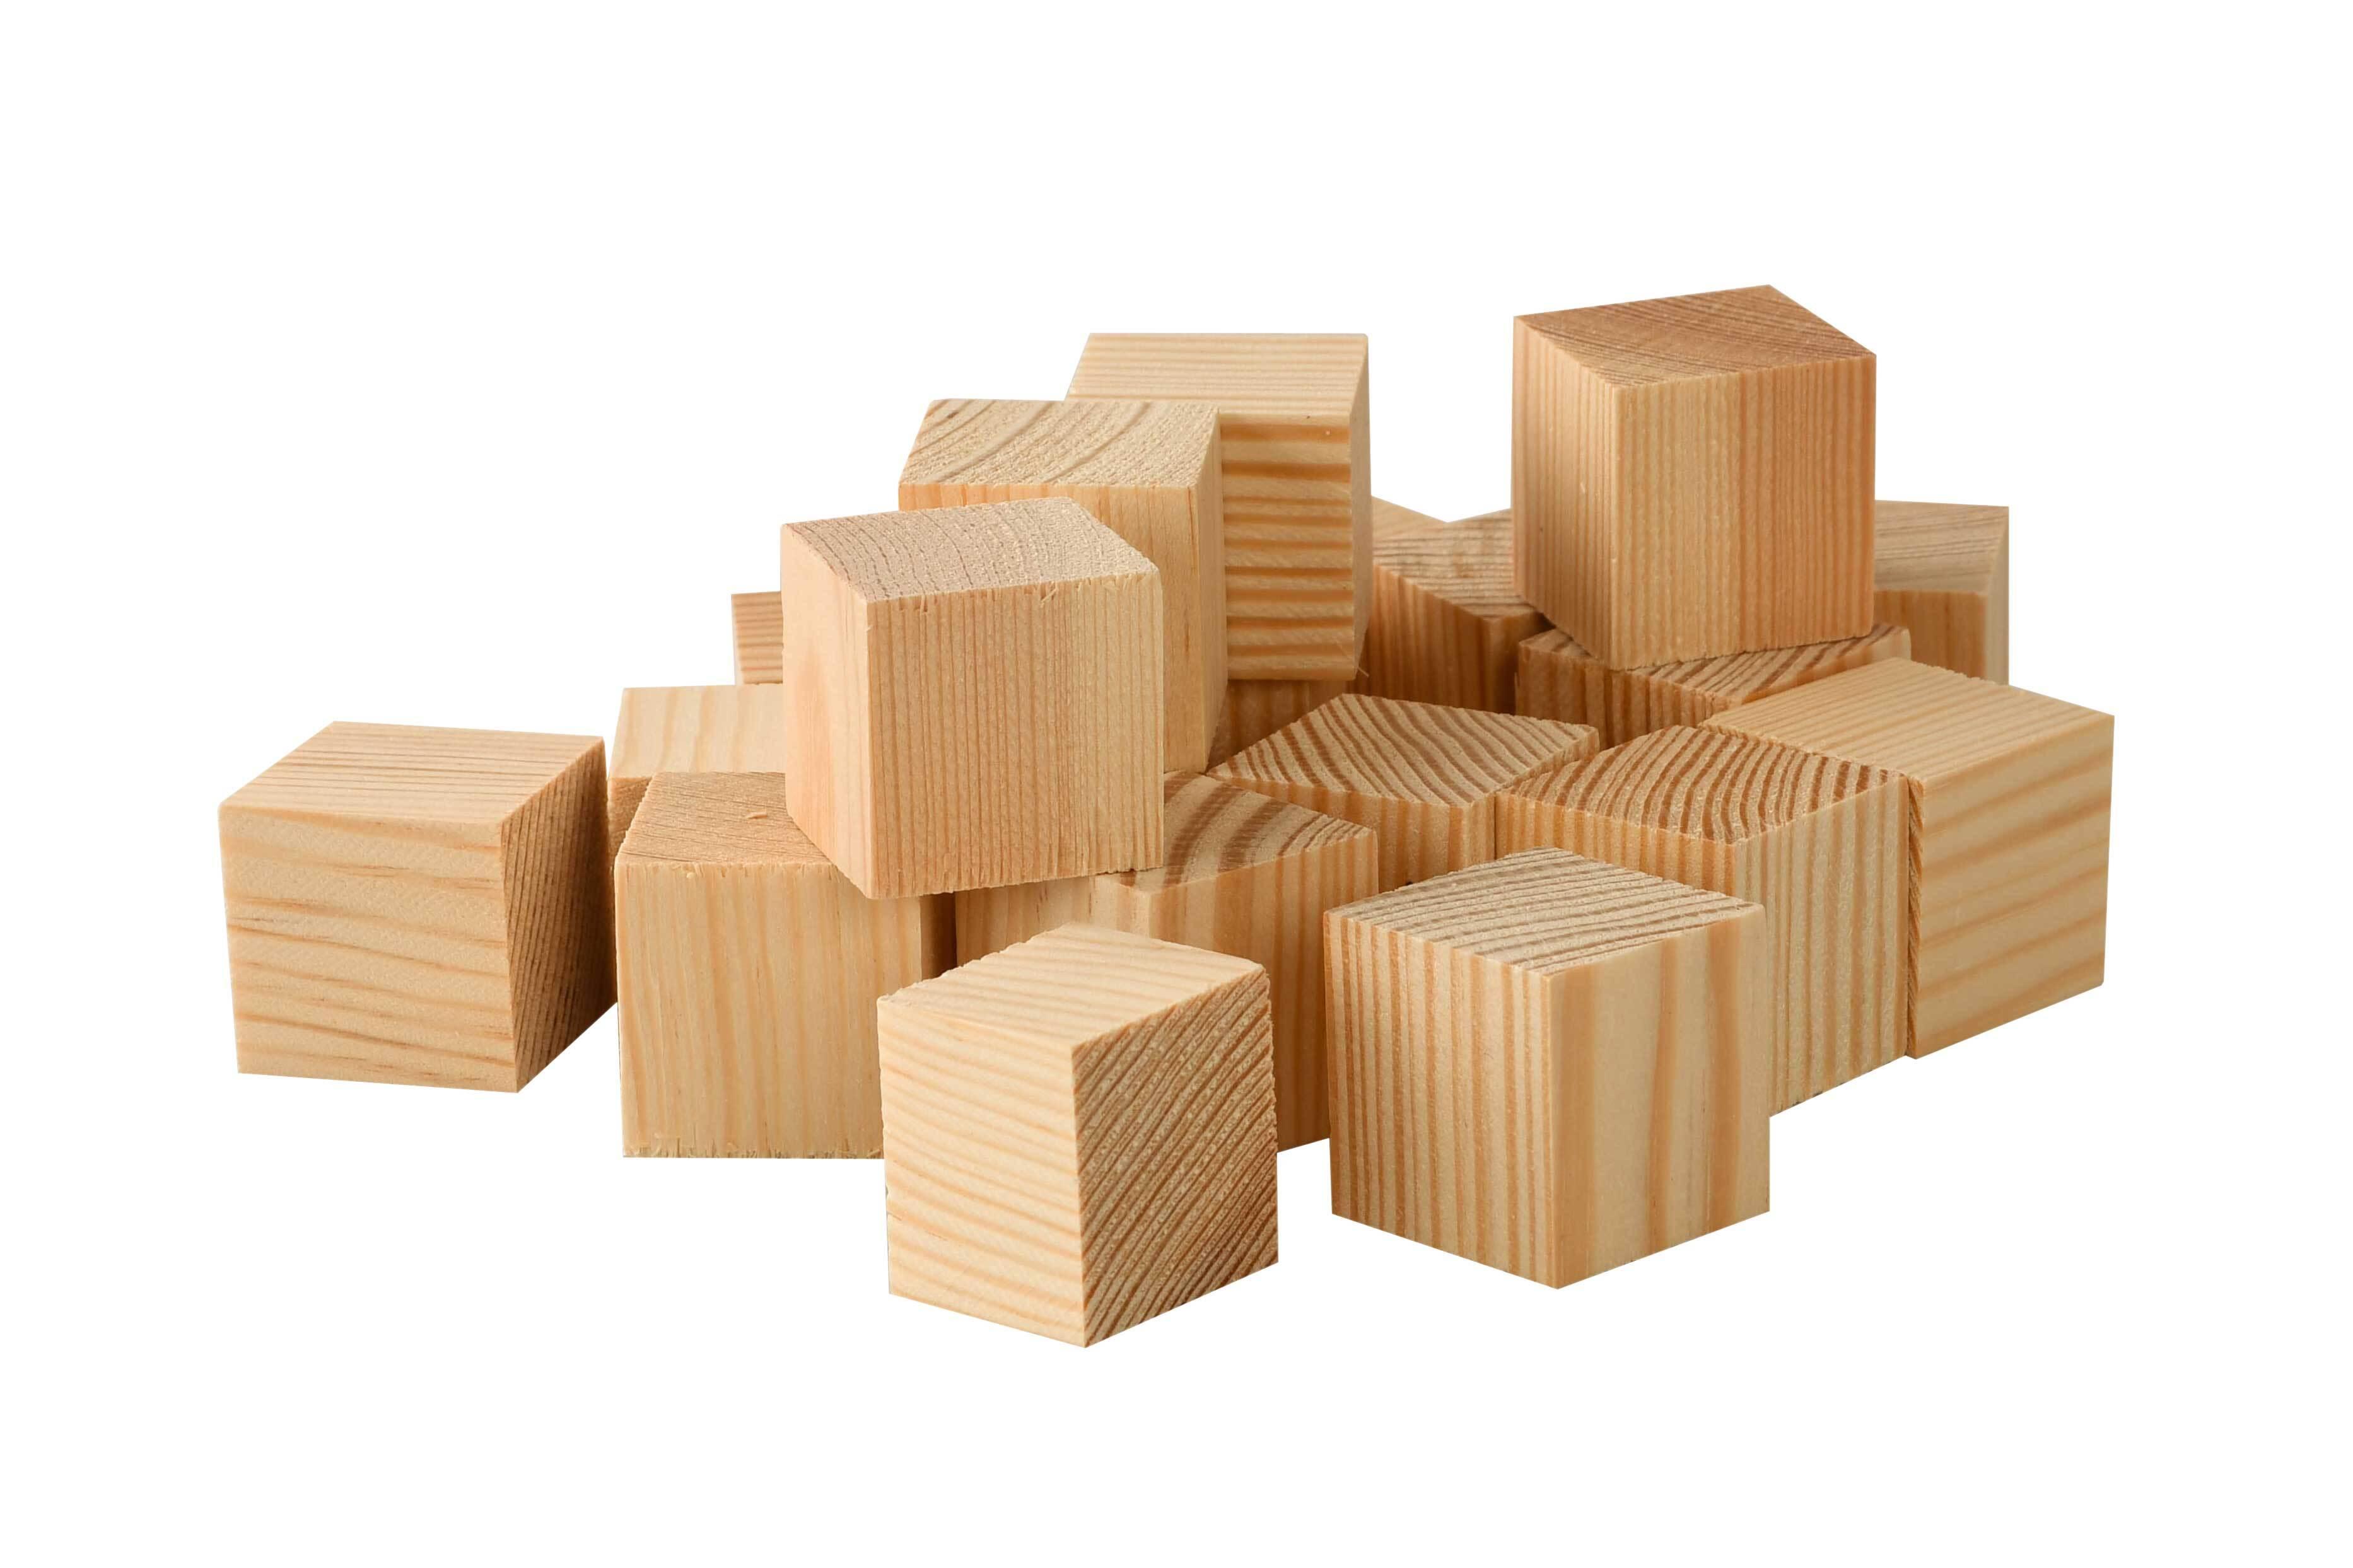 Holzwürfel Kiefer - 50er Pkg., 3x3x3 cm